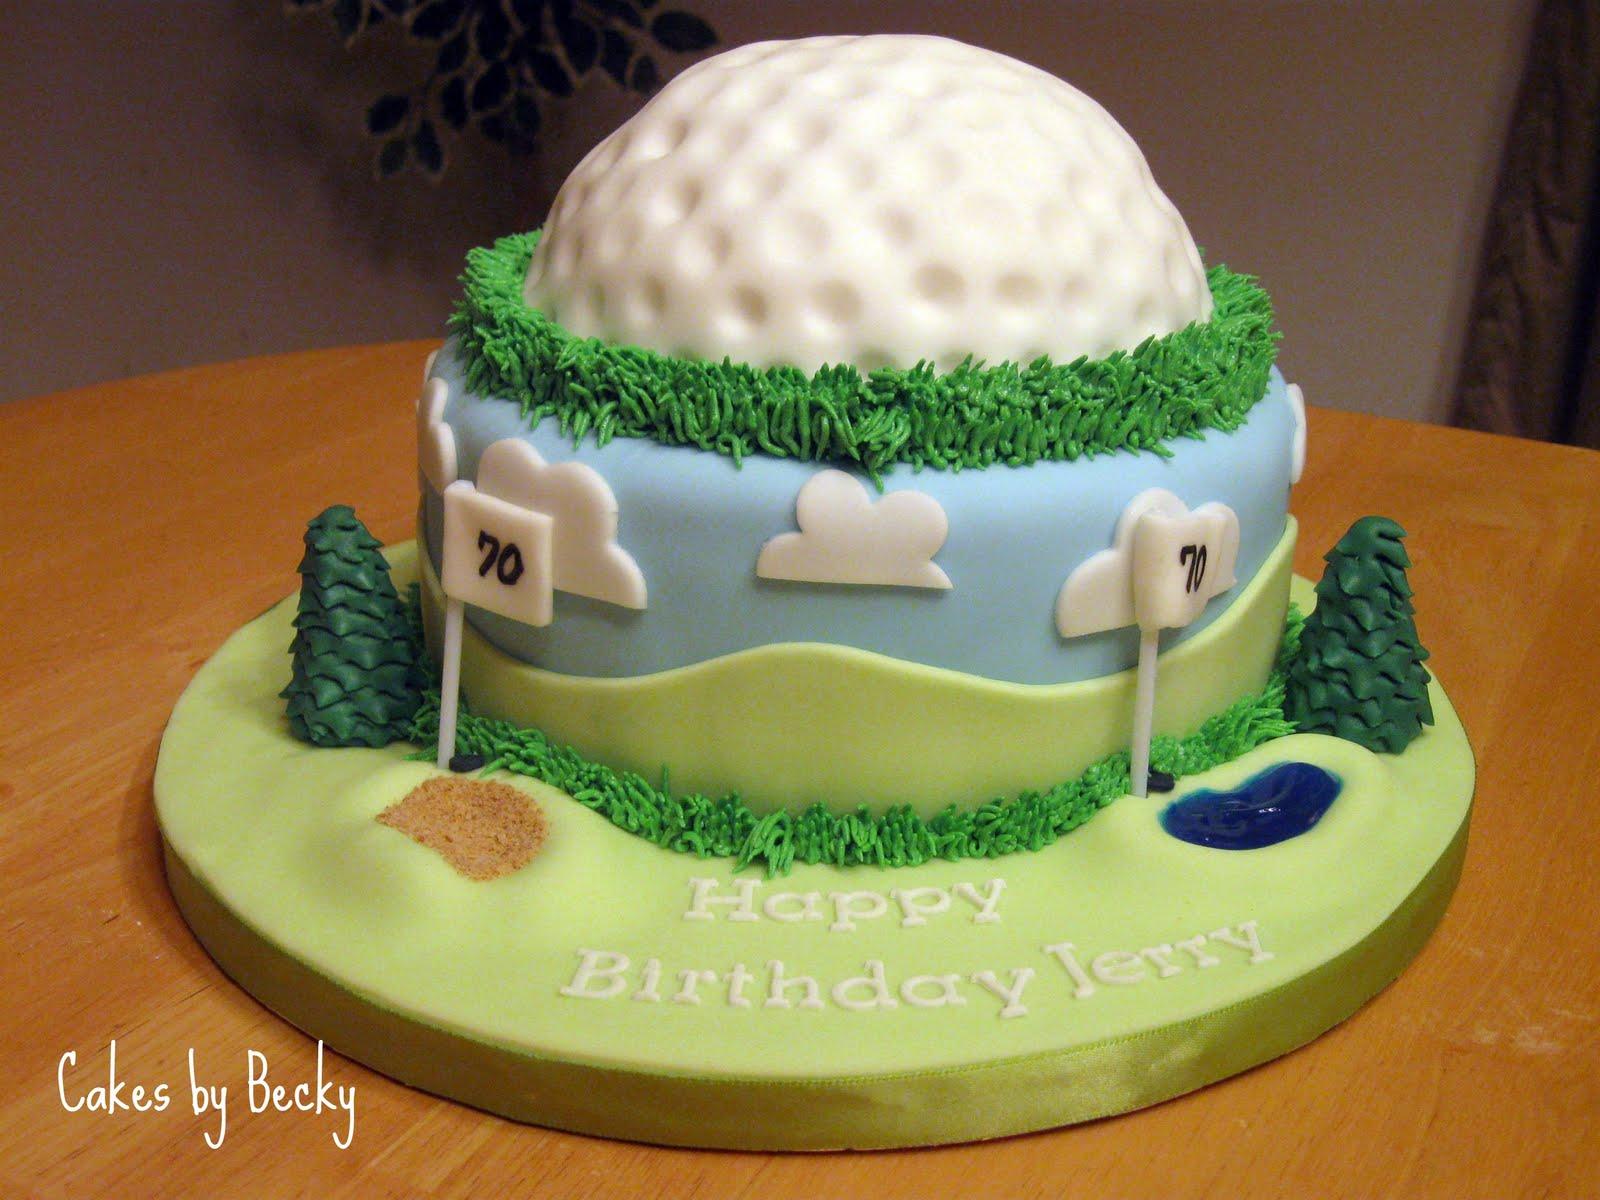 Cakes by Becky Golfers Birthday